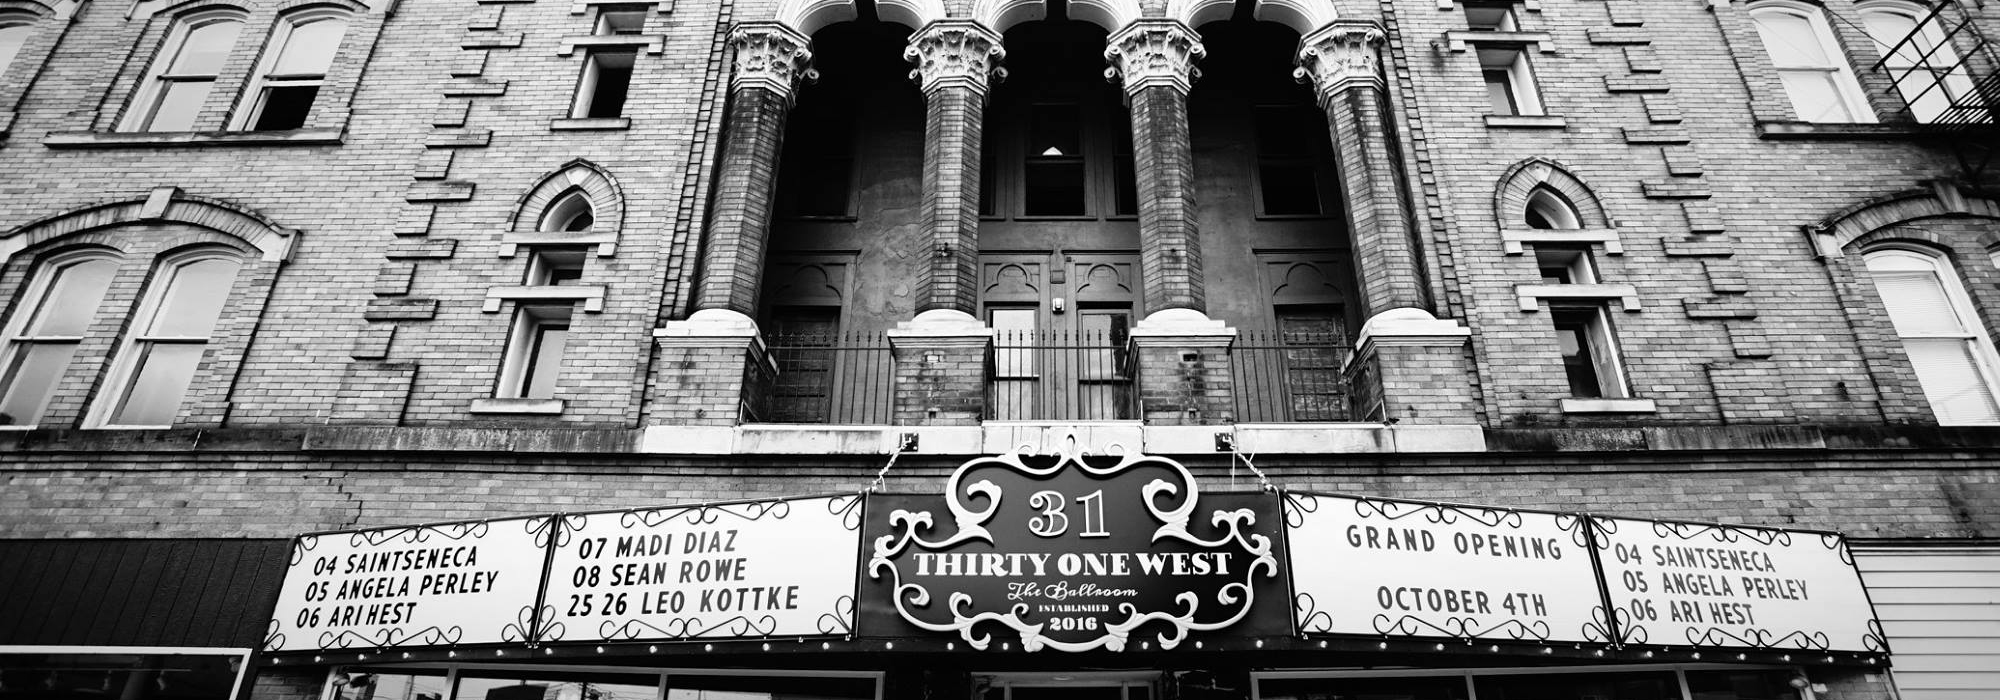 Lofts at Thirty One West (Loft D)